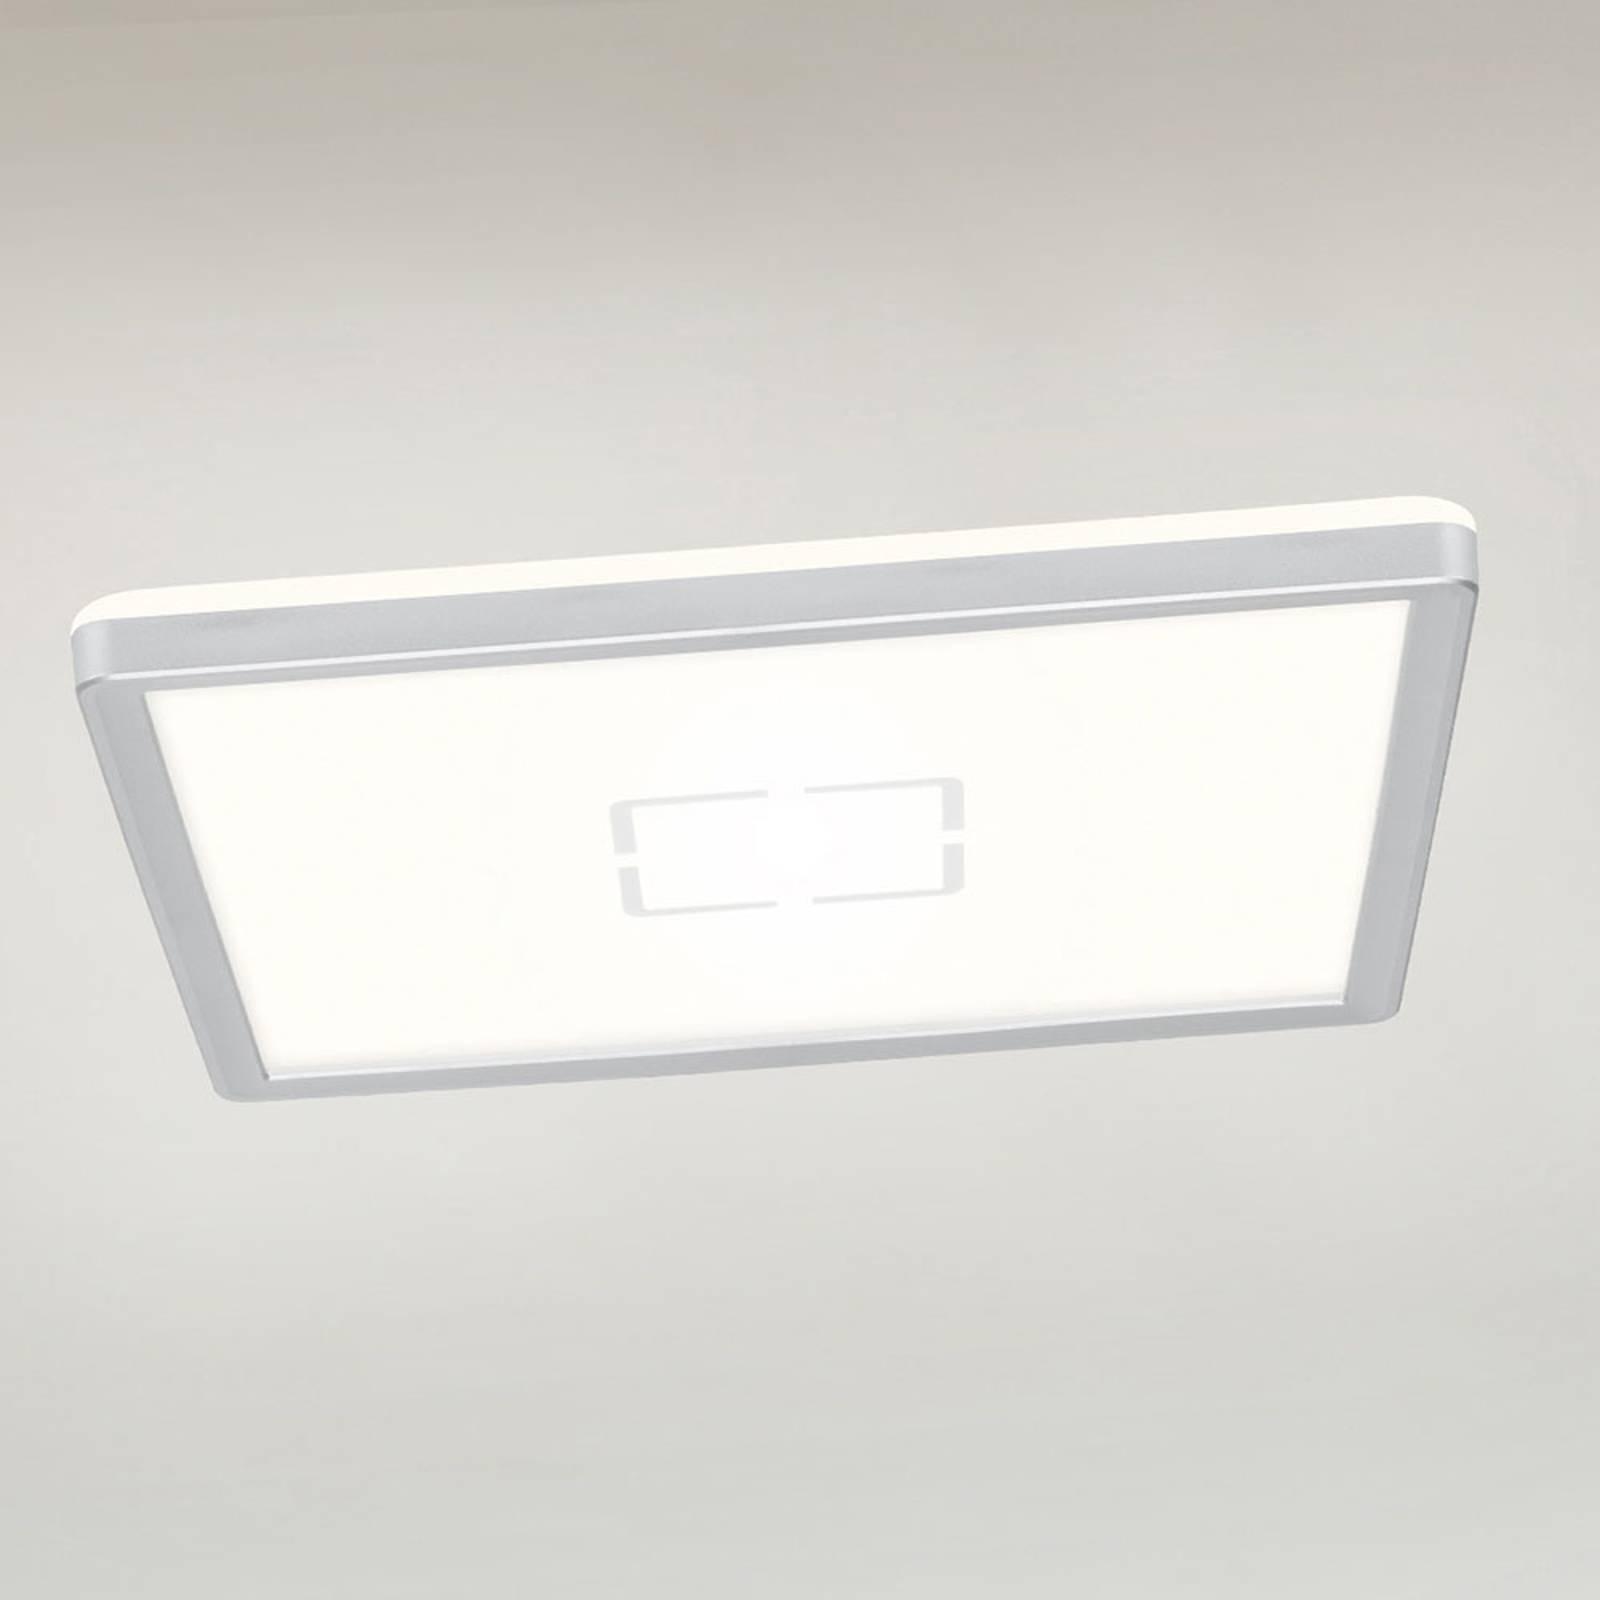 LED plafondlamp Free, 29 x 29 cm, zilver